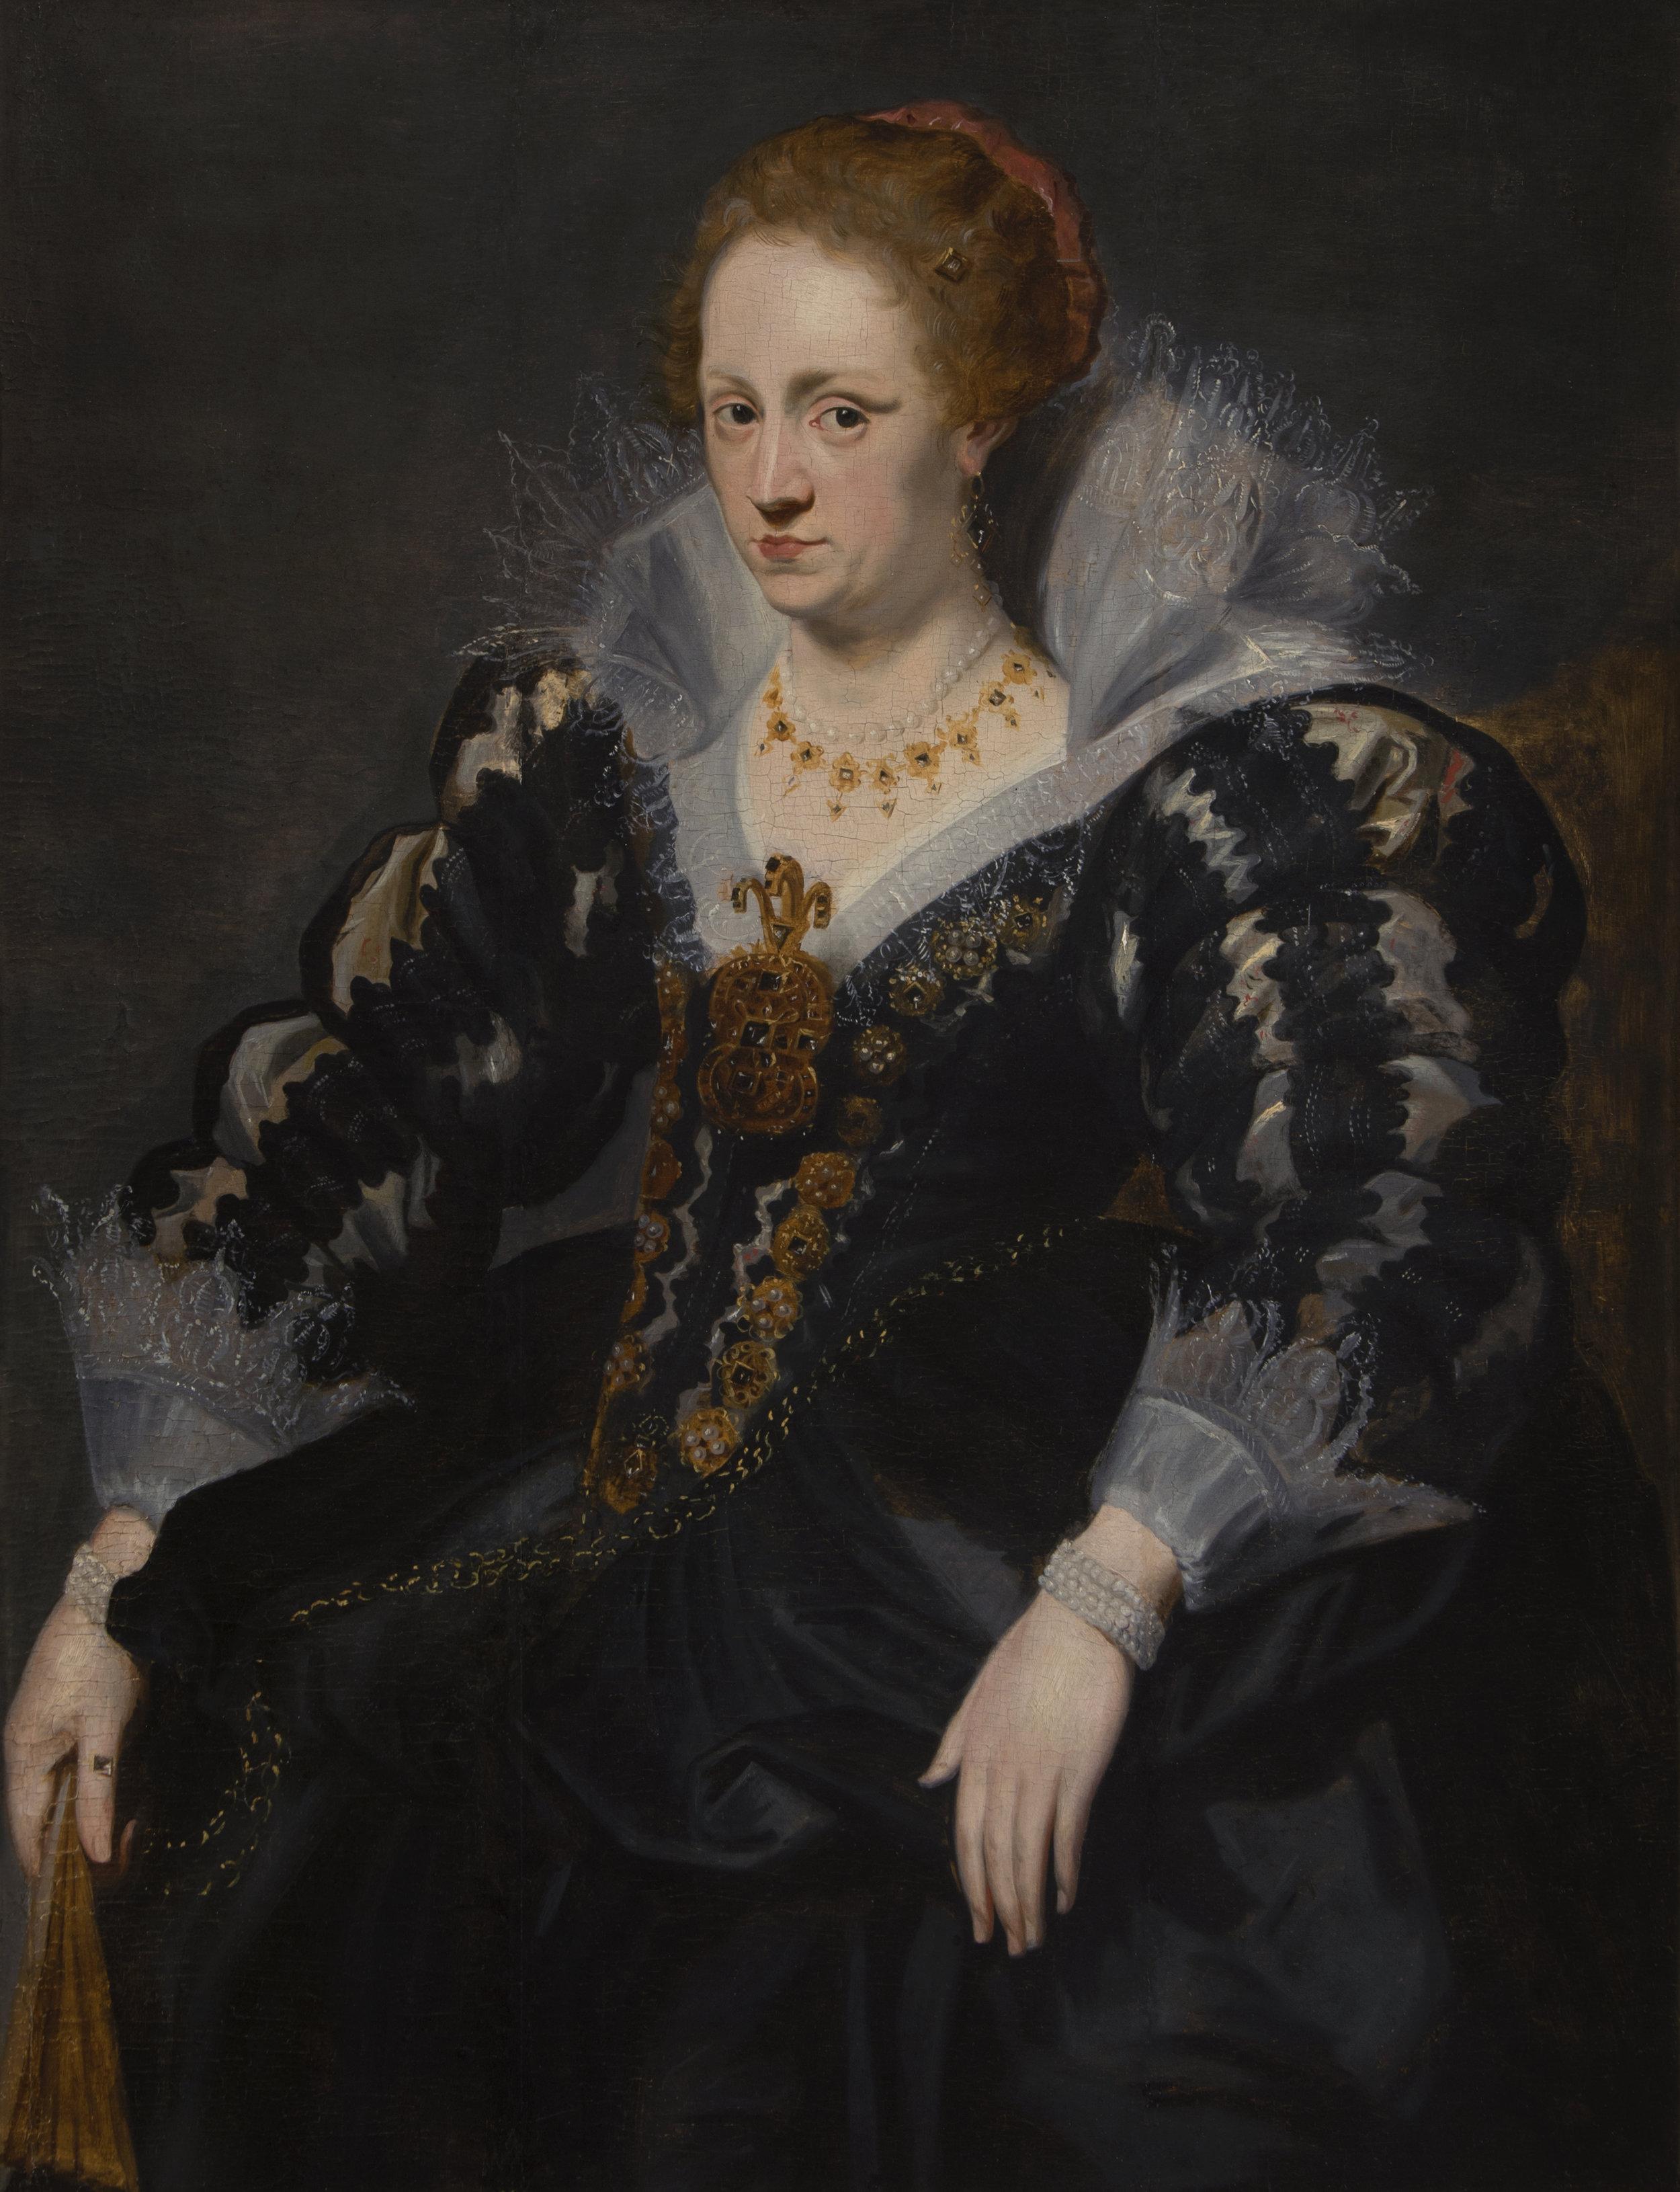 SIR ANTHONY VAN DYCK, ATT. TO   PORTRAIT OF JAQUELINE VAN CAESTRE, WIFE OF JEAN CHARLES DE CORDES